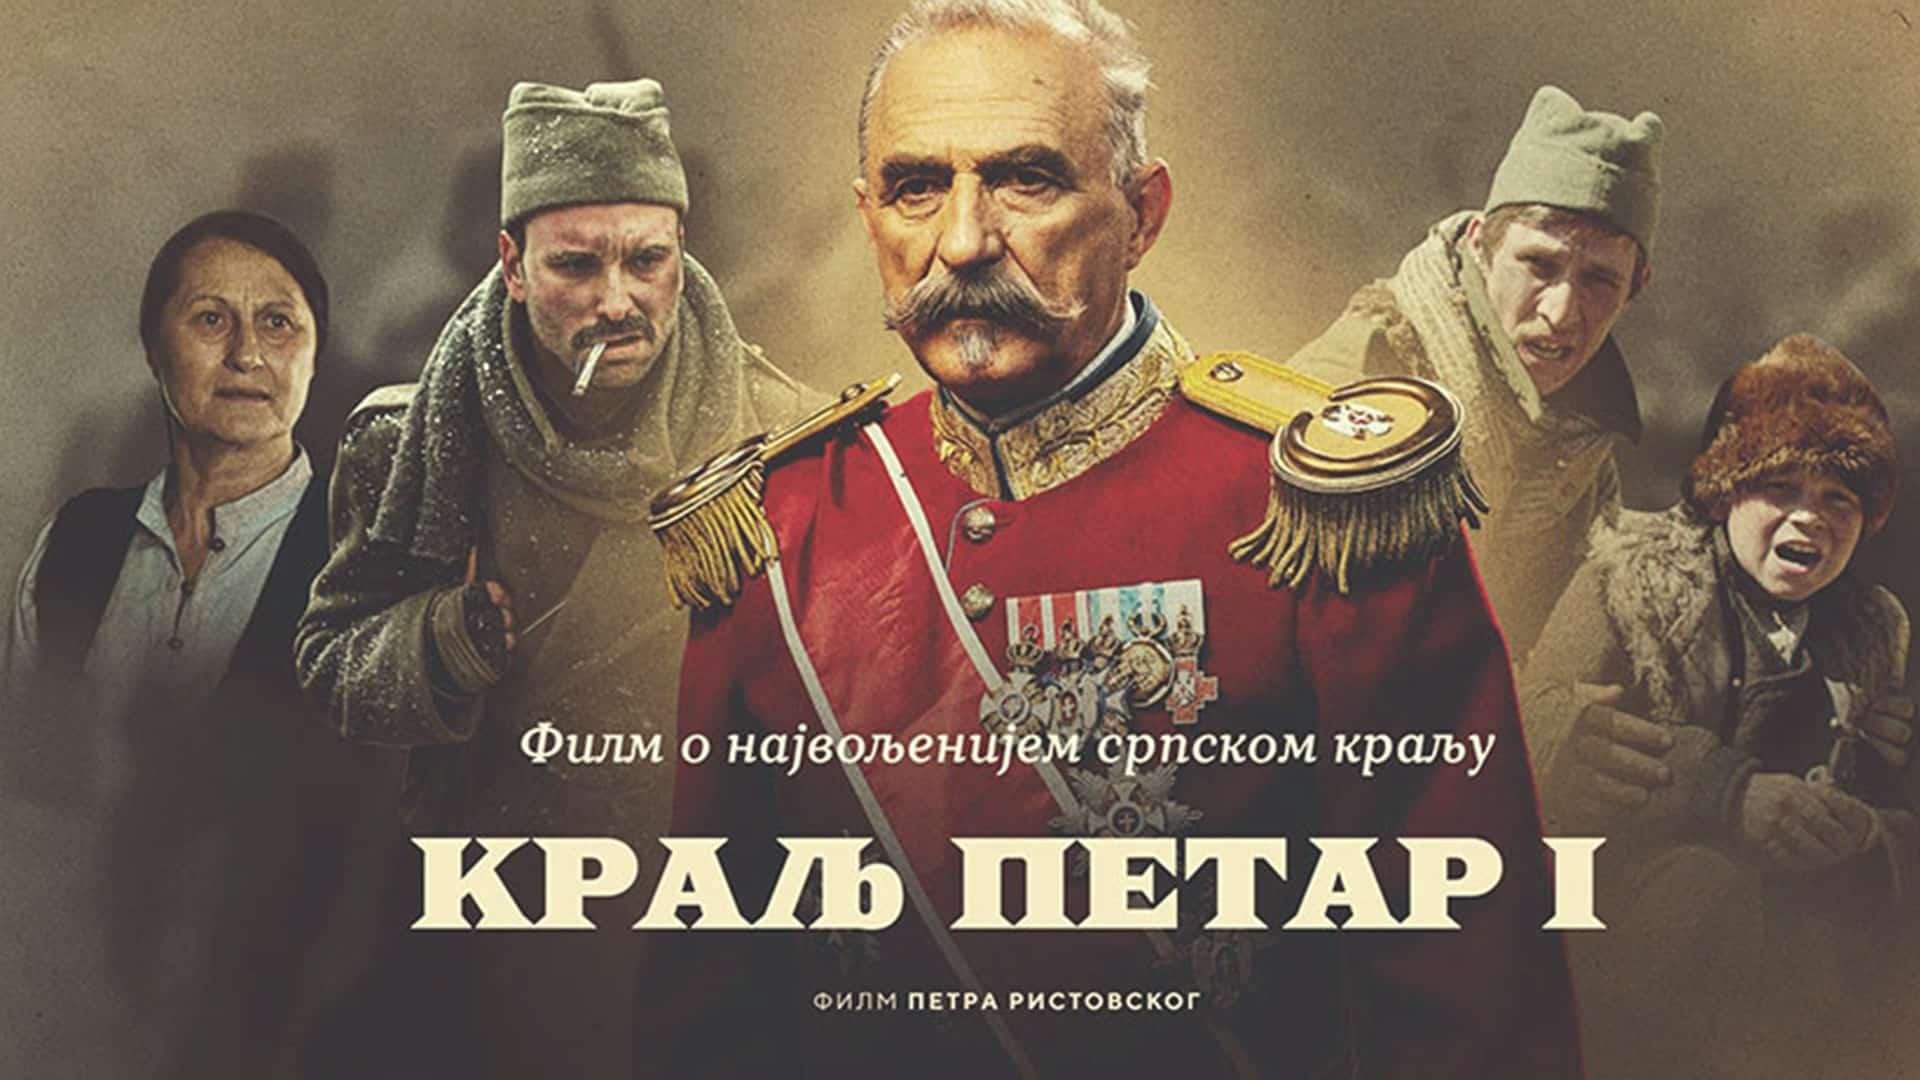 Kralj Petar Prvi Film